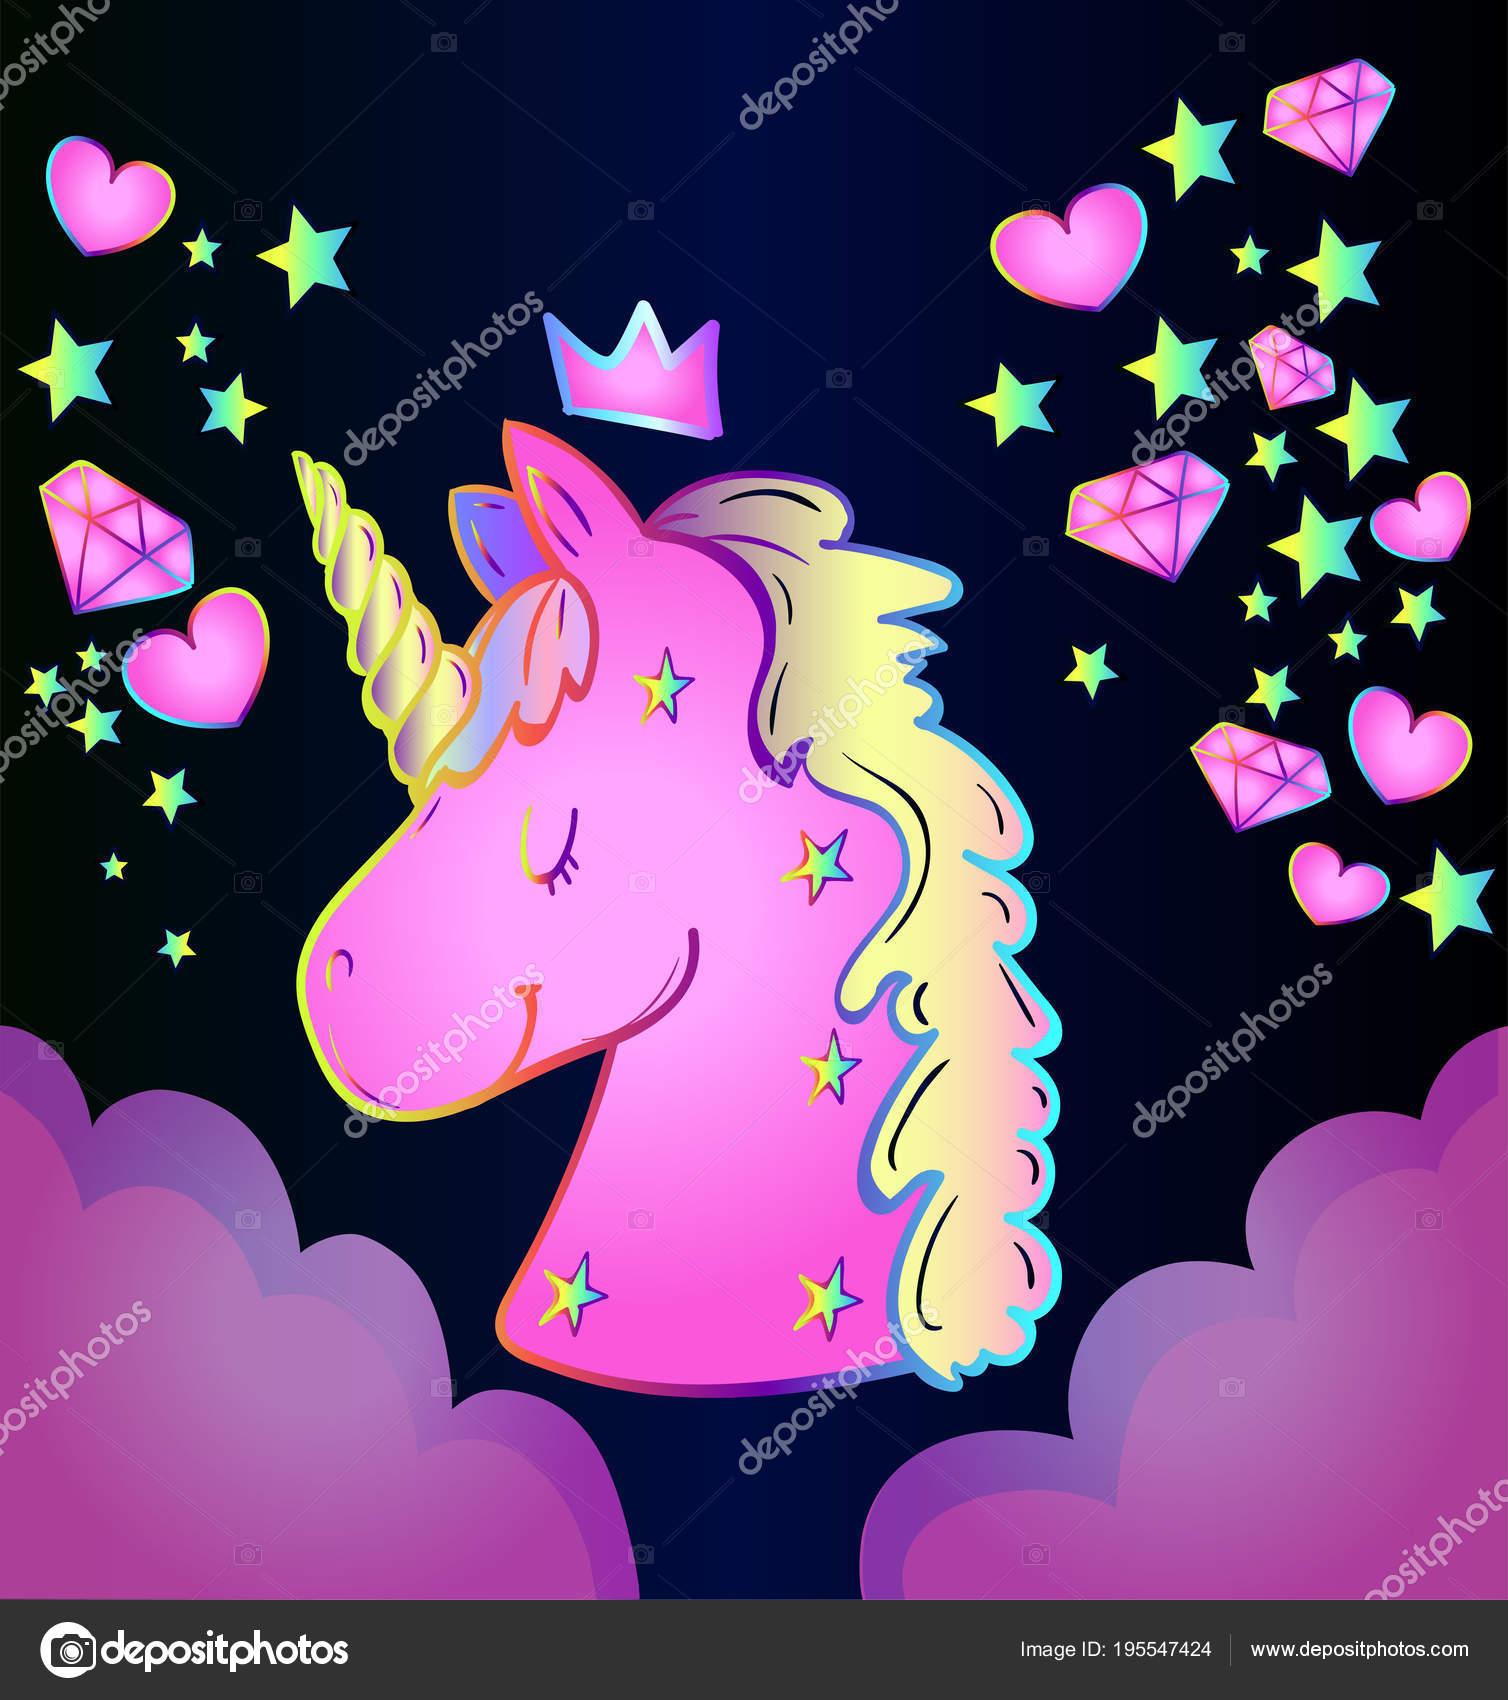 magic character animal unicorn blue gradient background stars hearts